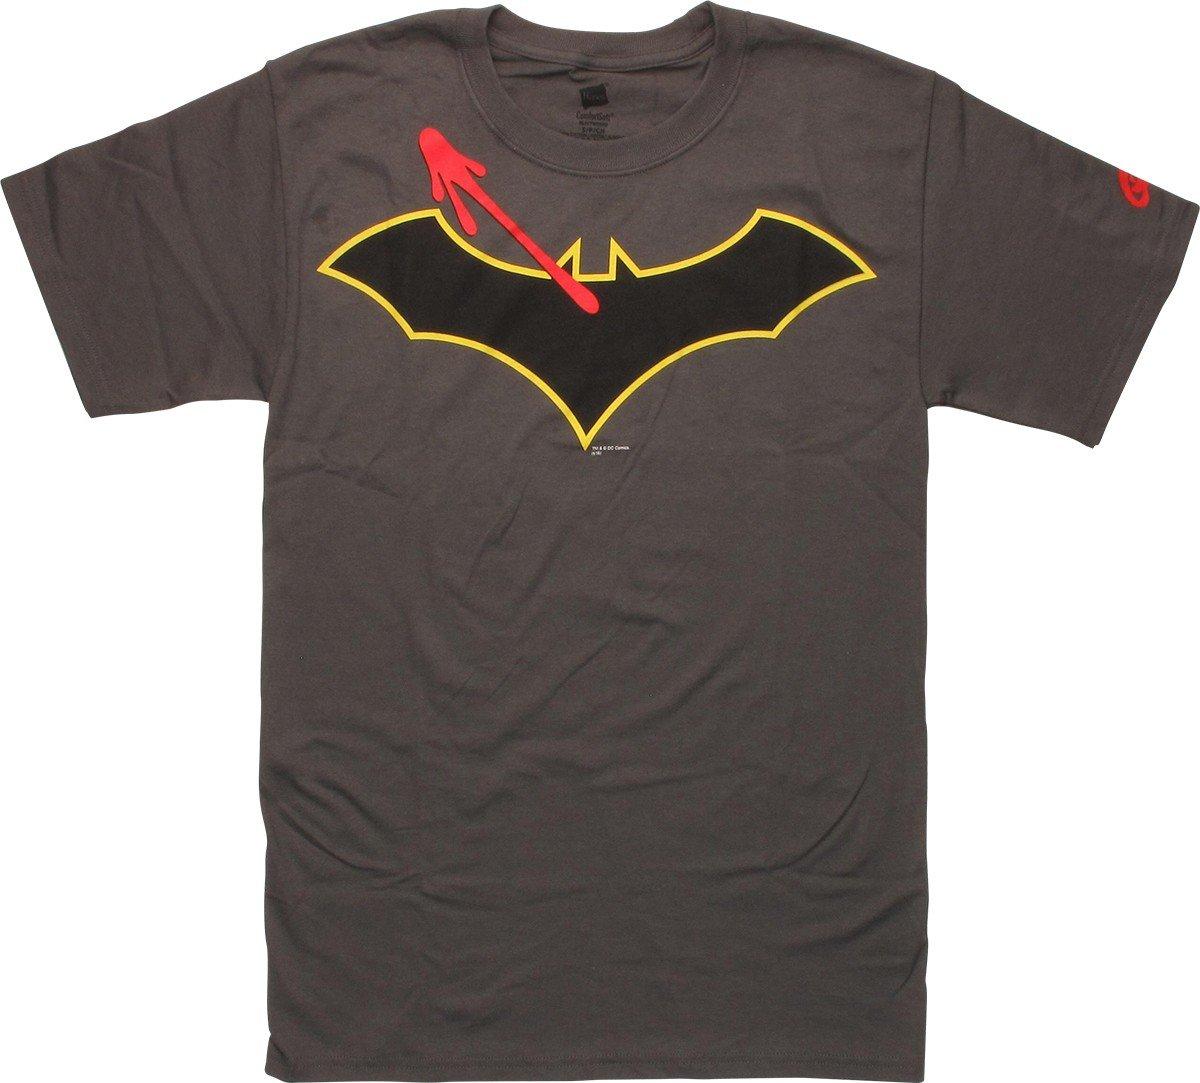 Stylinonline new batman rebirth logo tee get yours today batman watchmen symbol logo t shirt buycottarizona